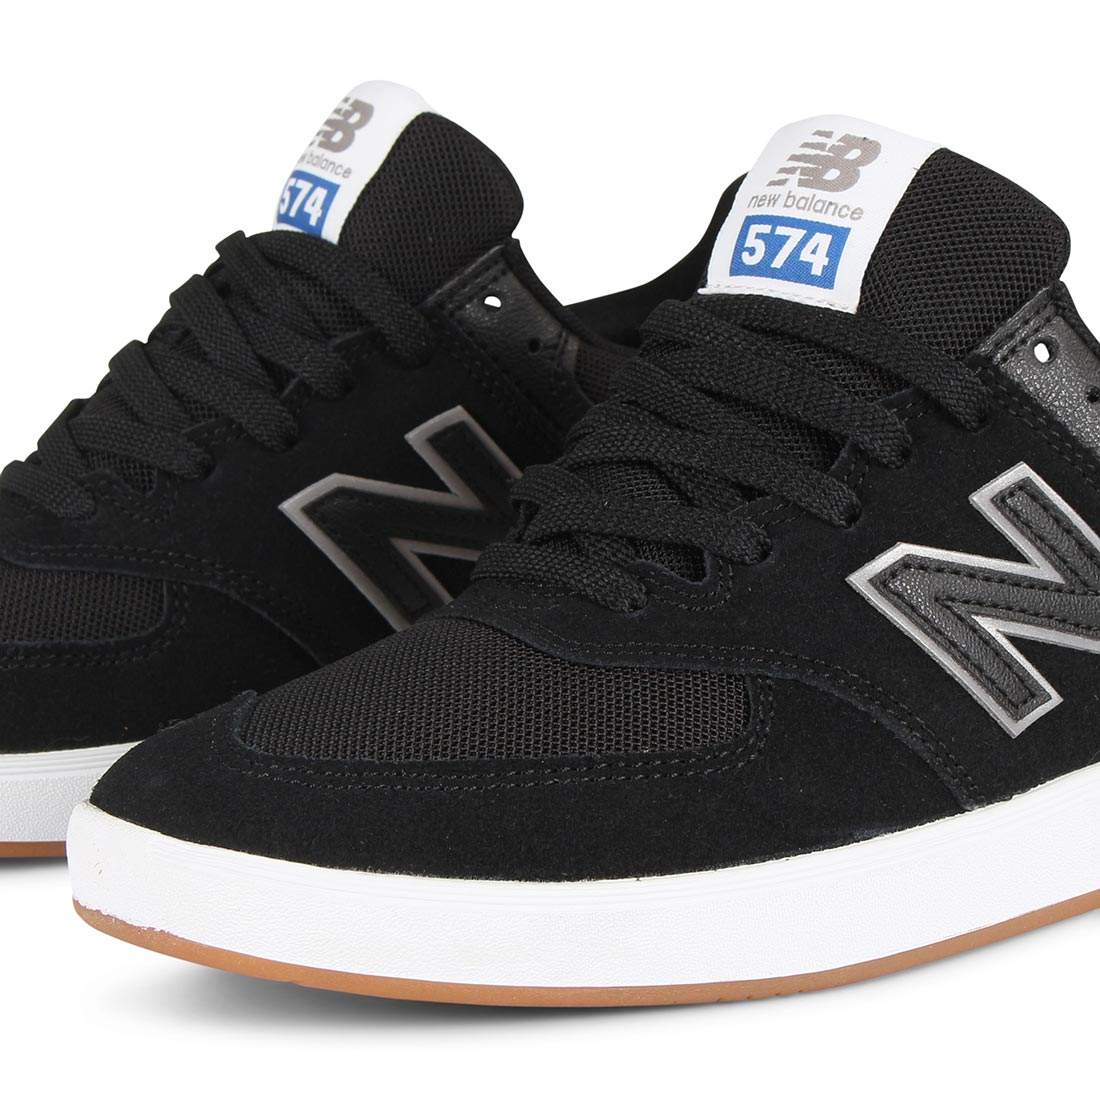 premium selection 1b734 64403 New Balance All Coasts 574 Shoes - Black / Brown